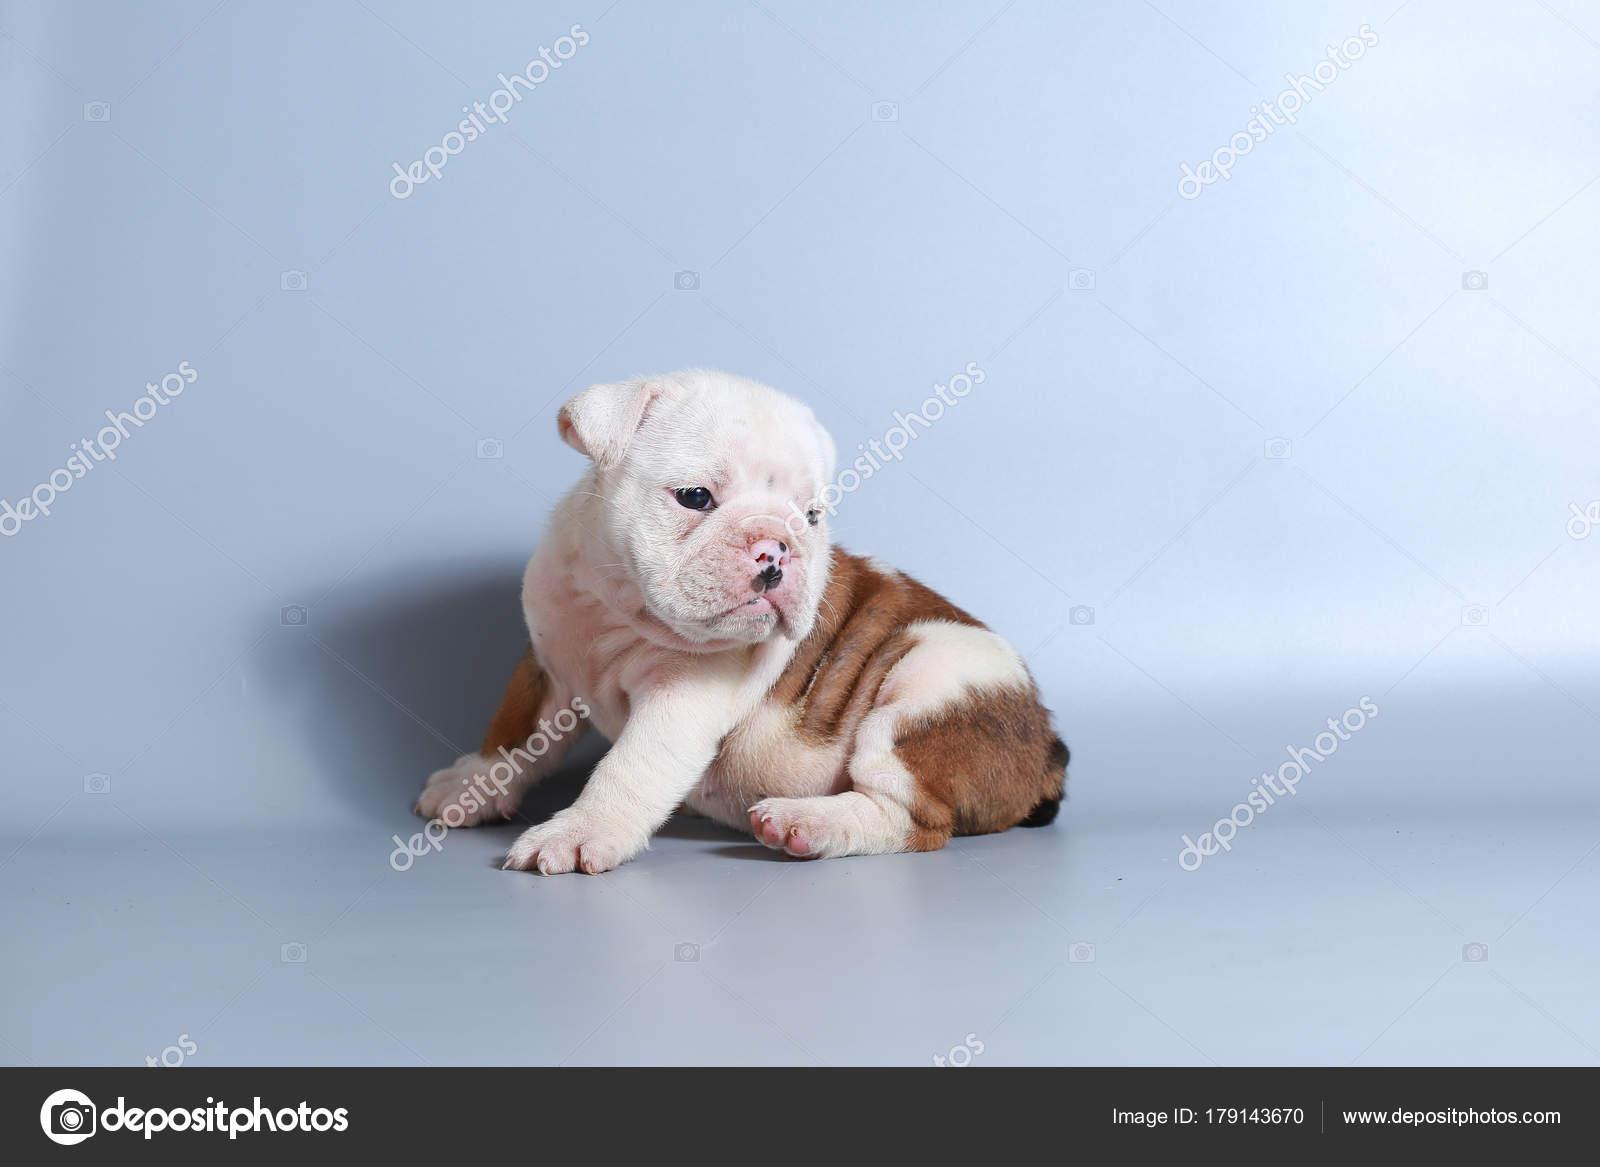 Month Purebred English Bulldog Puppy Gray Screen Stock Photo C S Thanawathreborn Gmail Com 179143670